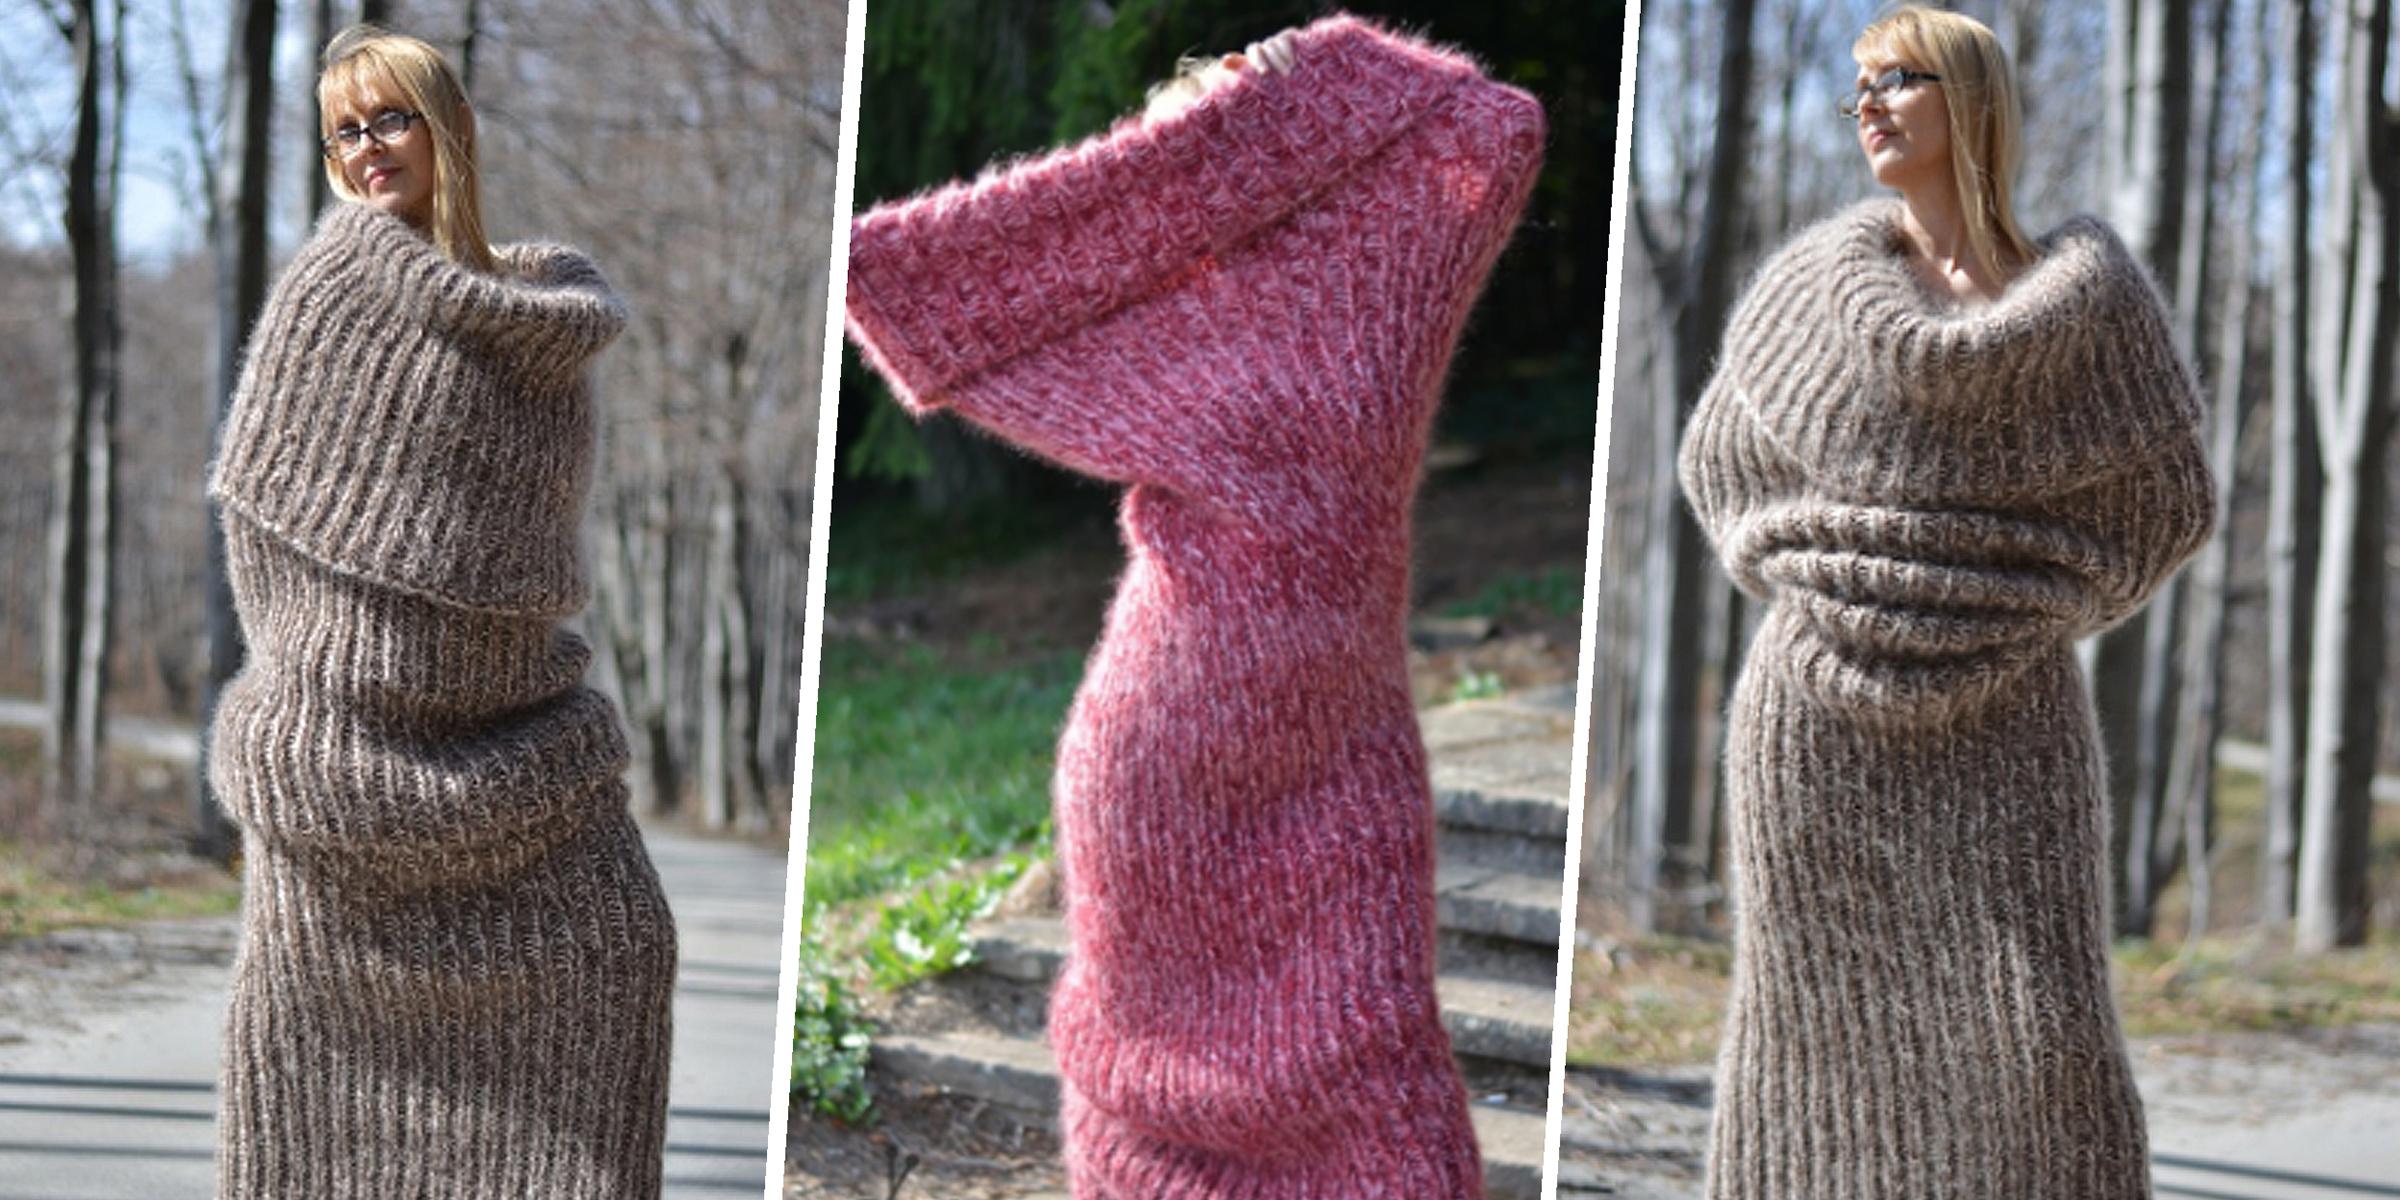 Dukyana's floor-length 'tube sock' scarf goes viral | 2400 x 1200 jpeg 1705kB